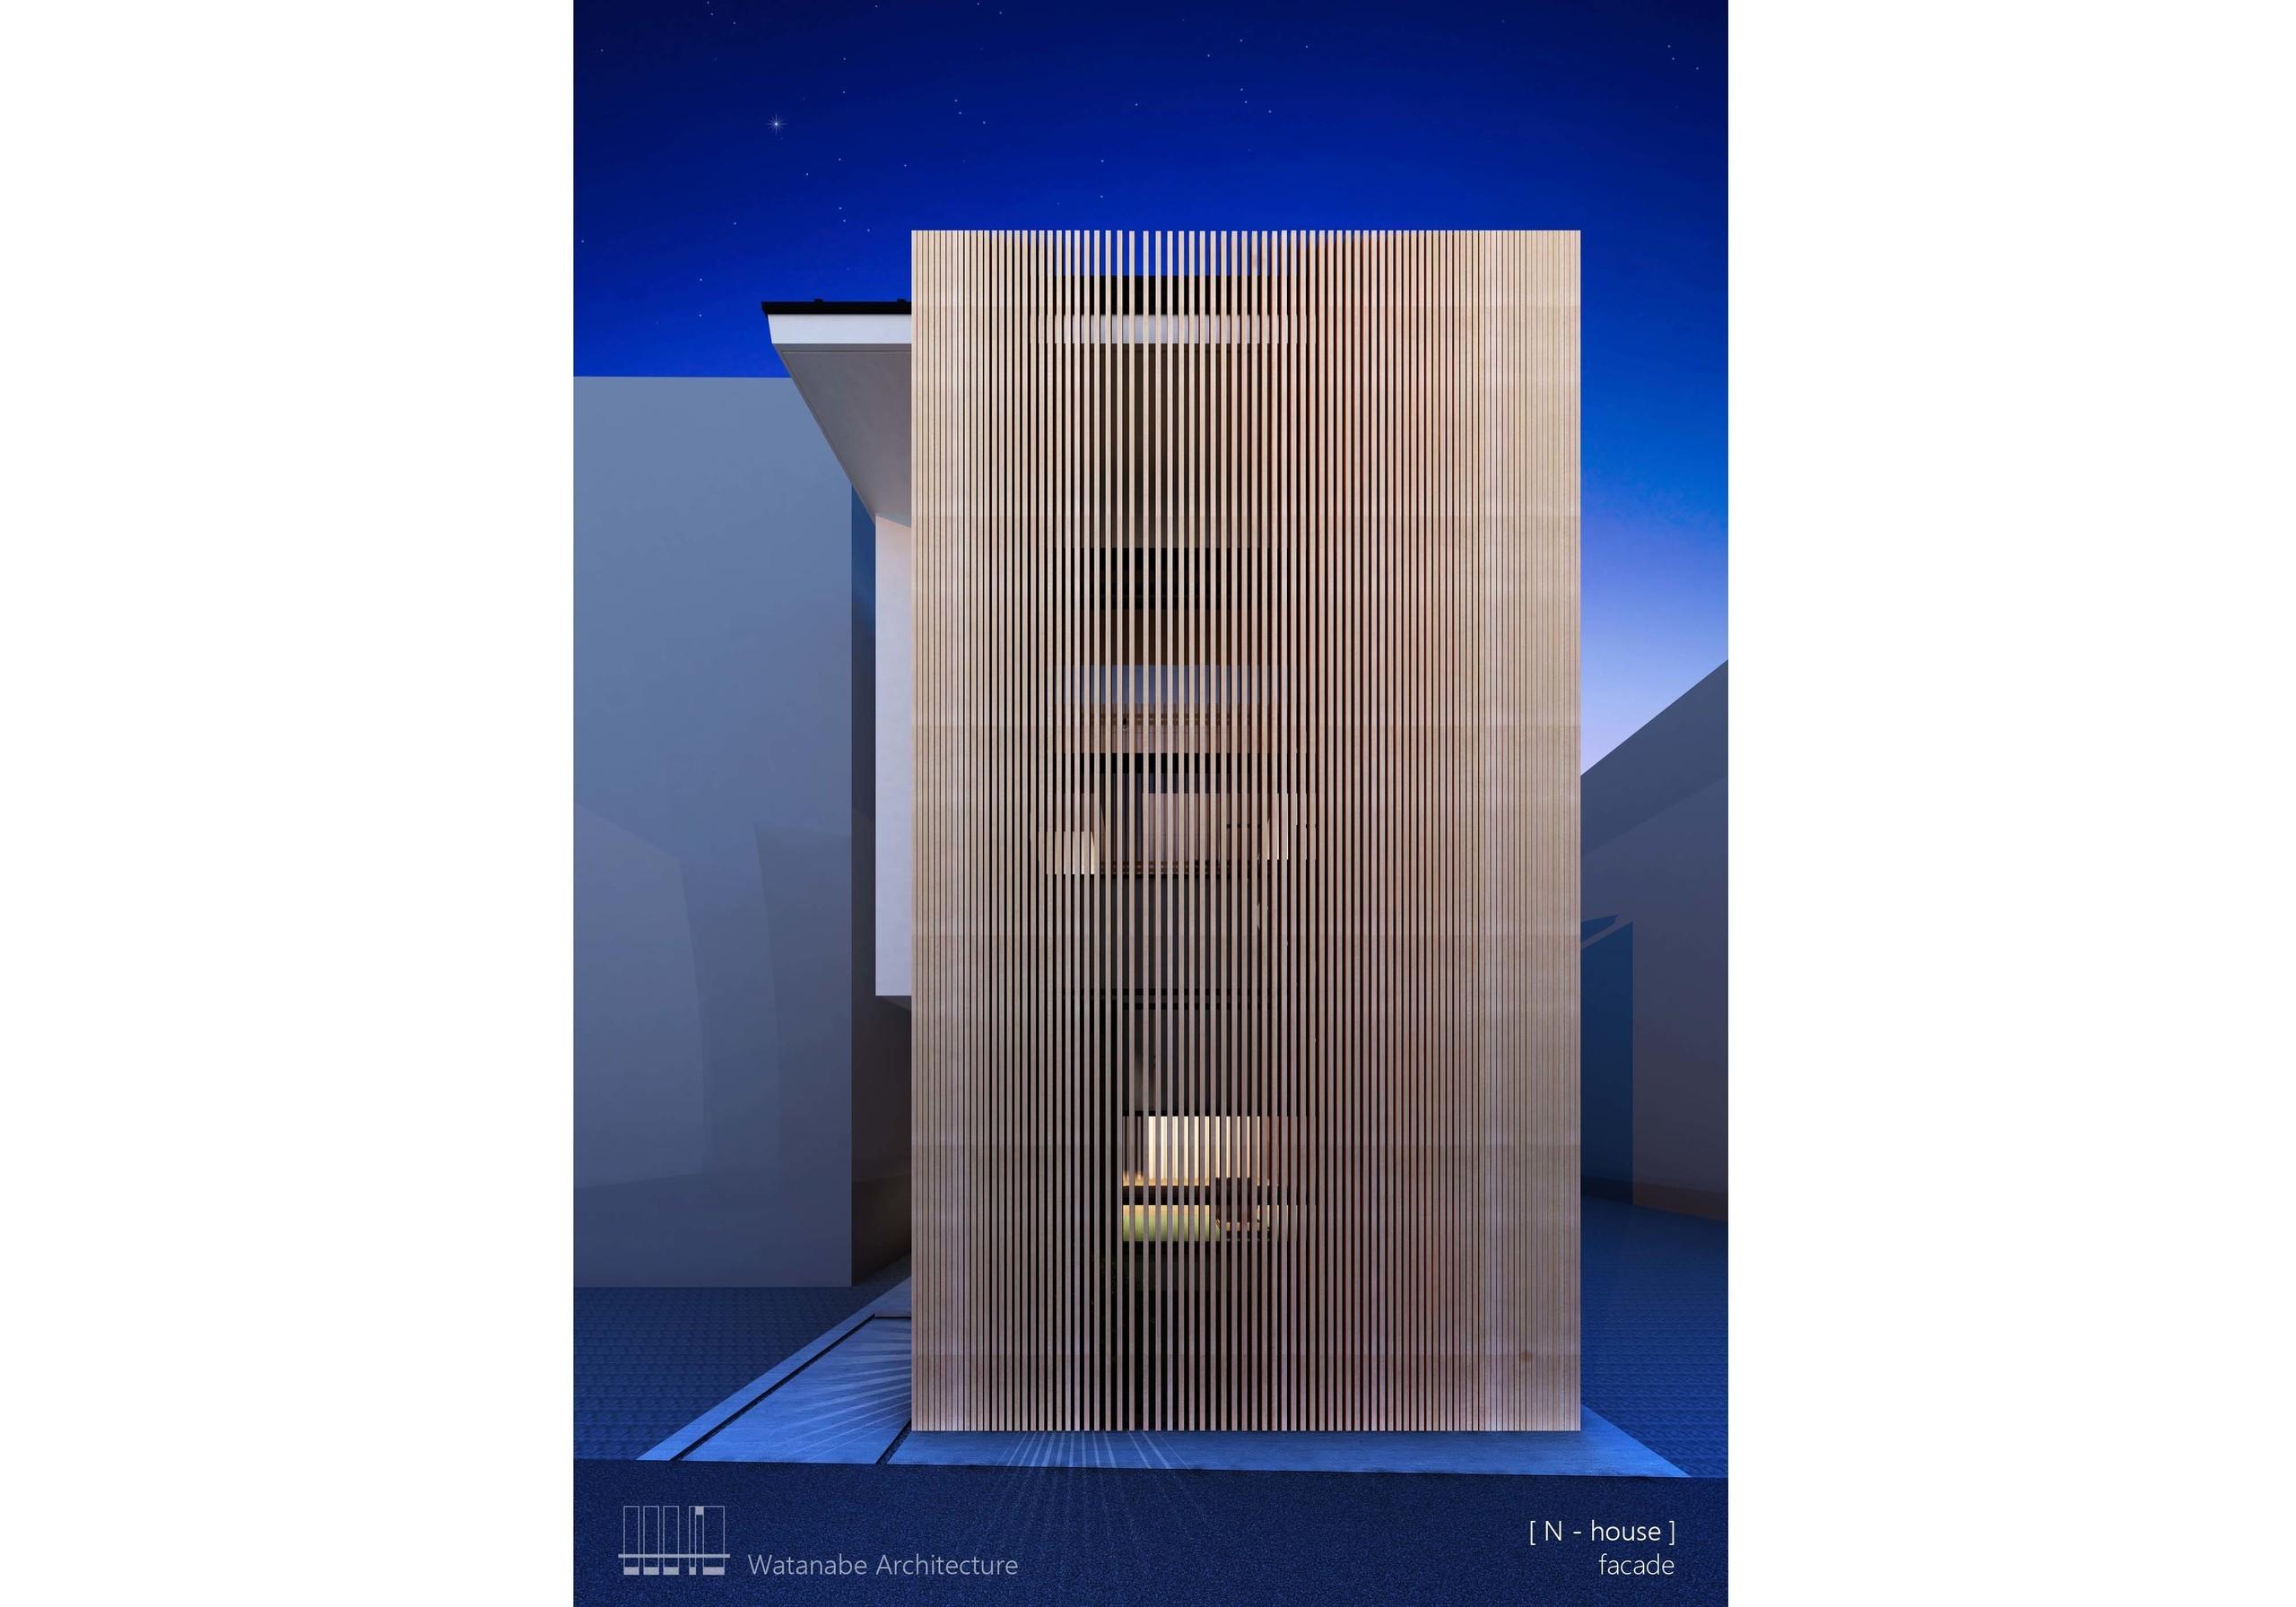 間口5m敷地の家(計画中)の建築事例写真